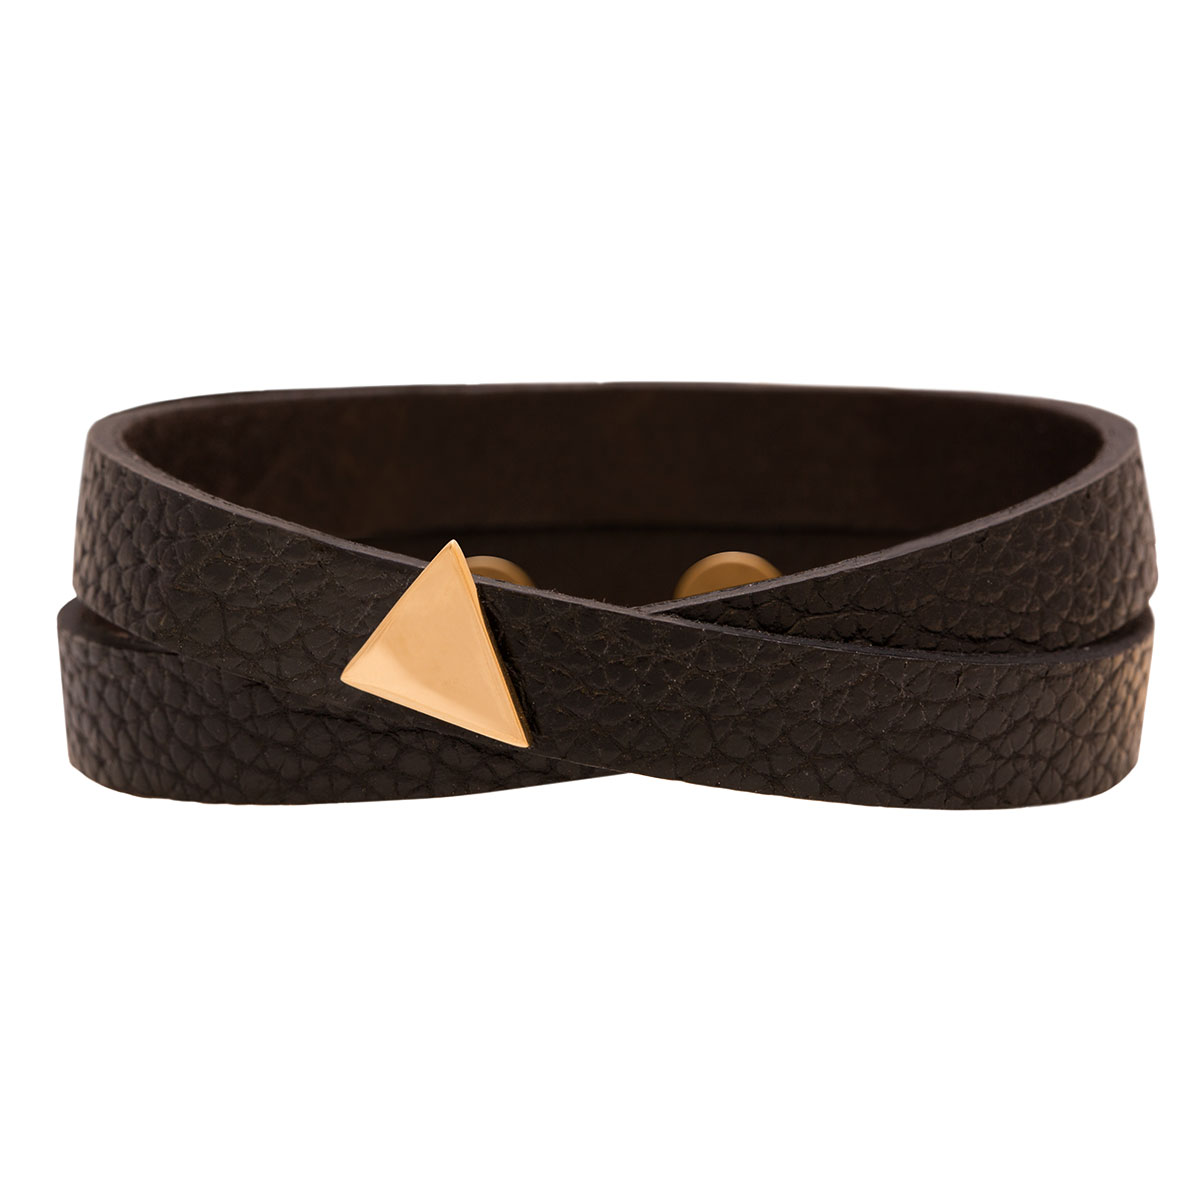 دستبند مثلث